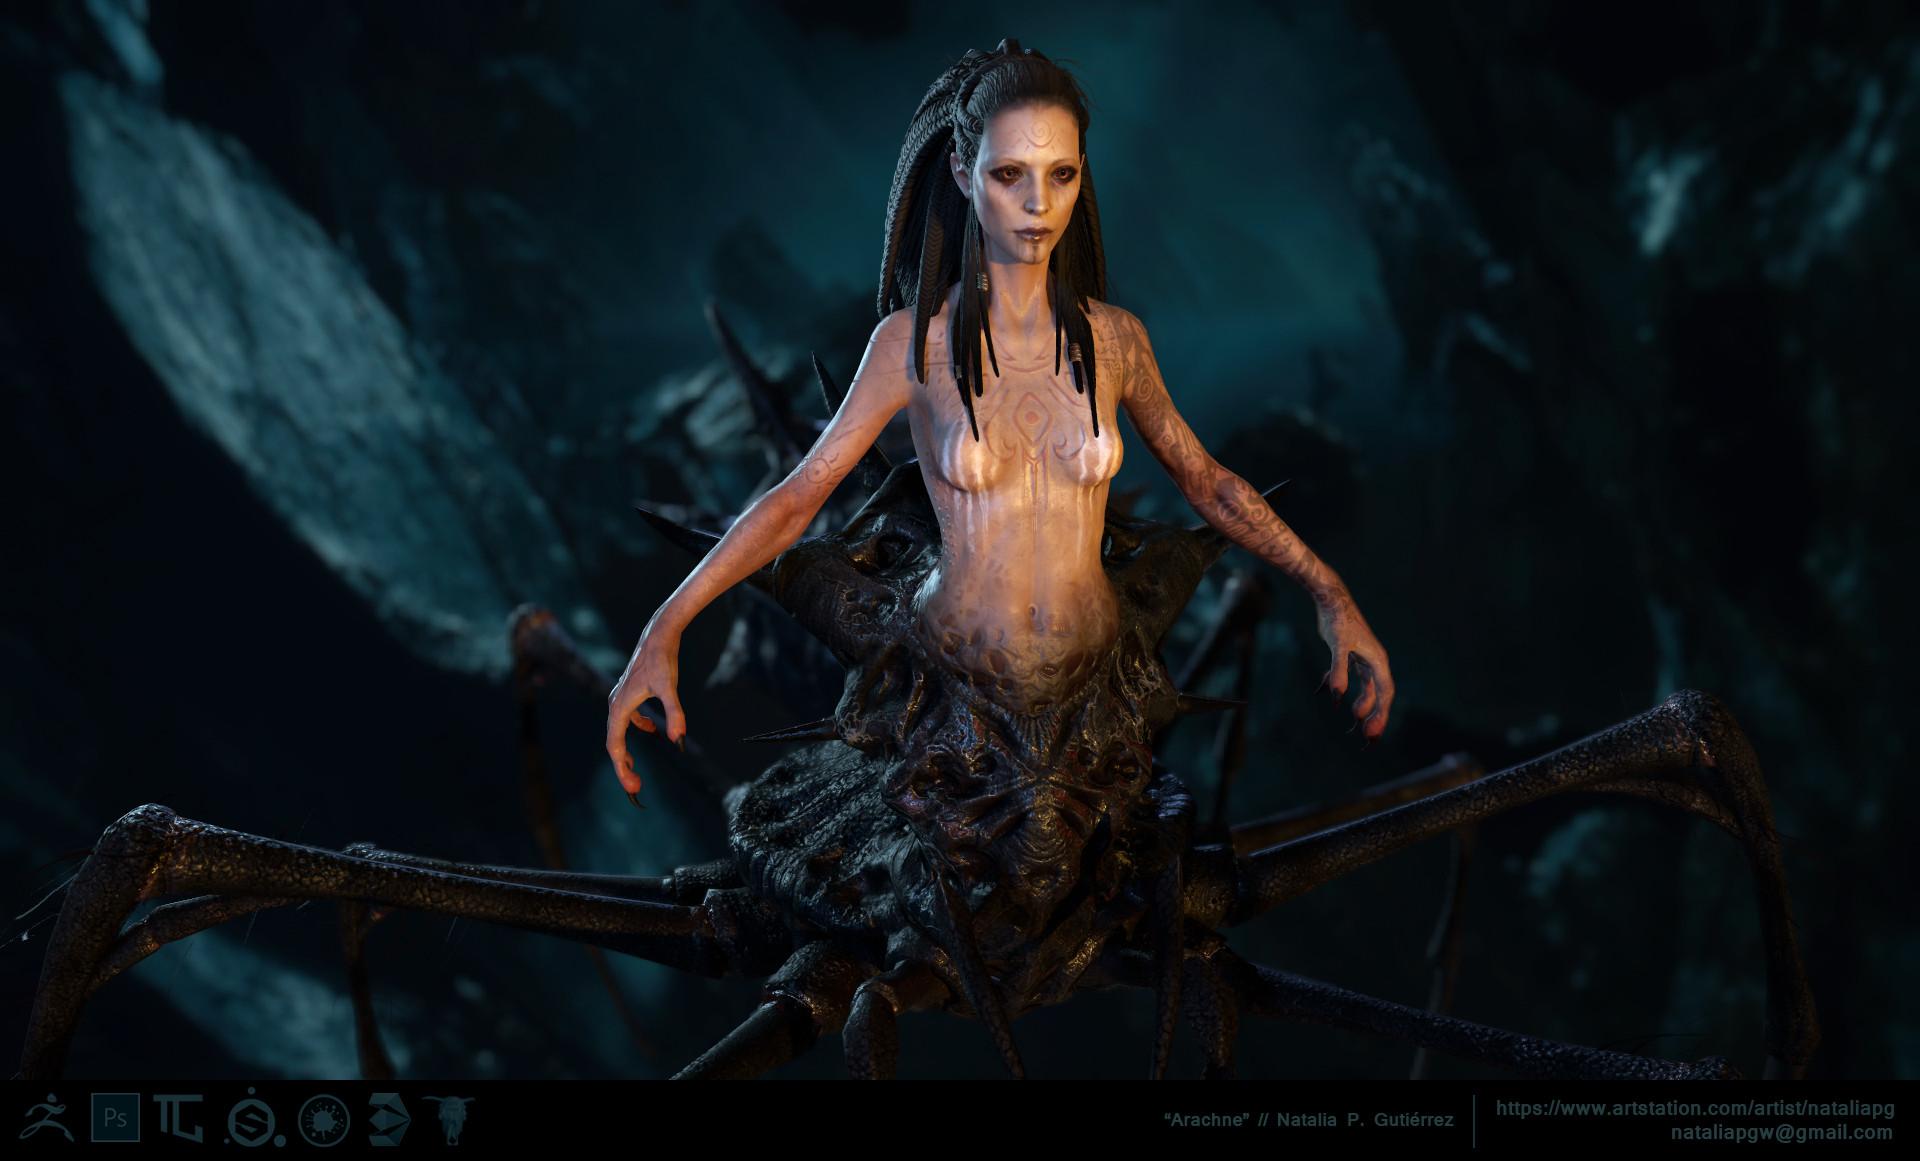 Natalia p gutierrez arachneview 1